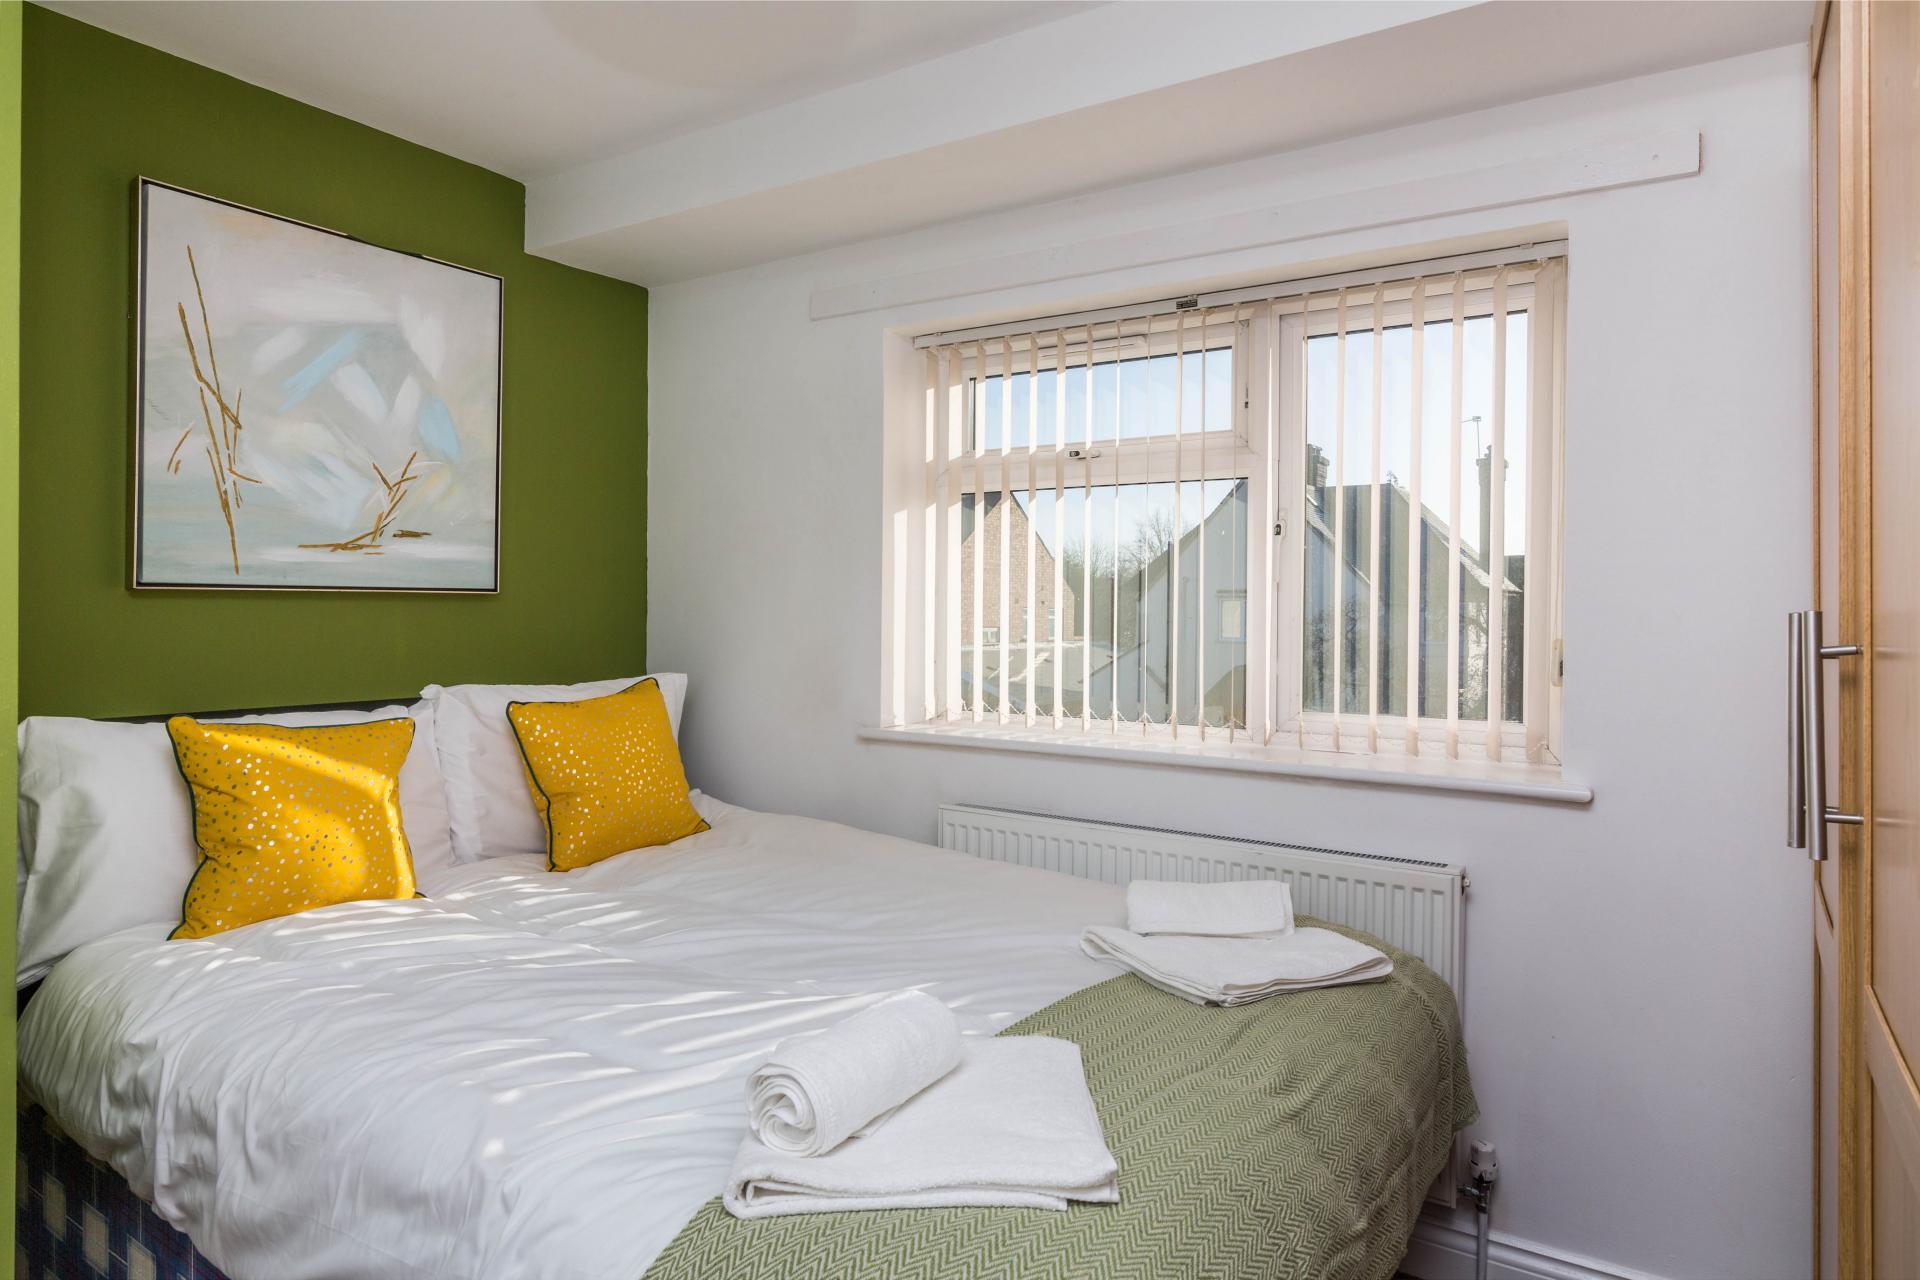 Double bed at Mayo House, Carrington, Nottingham - Citybase Apartments